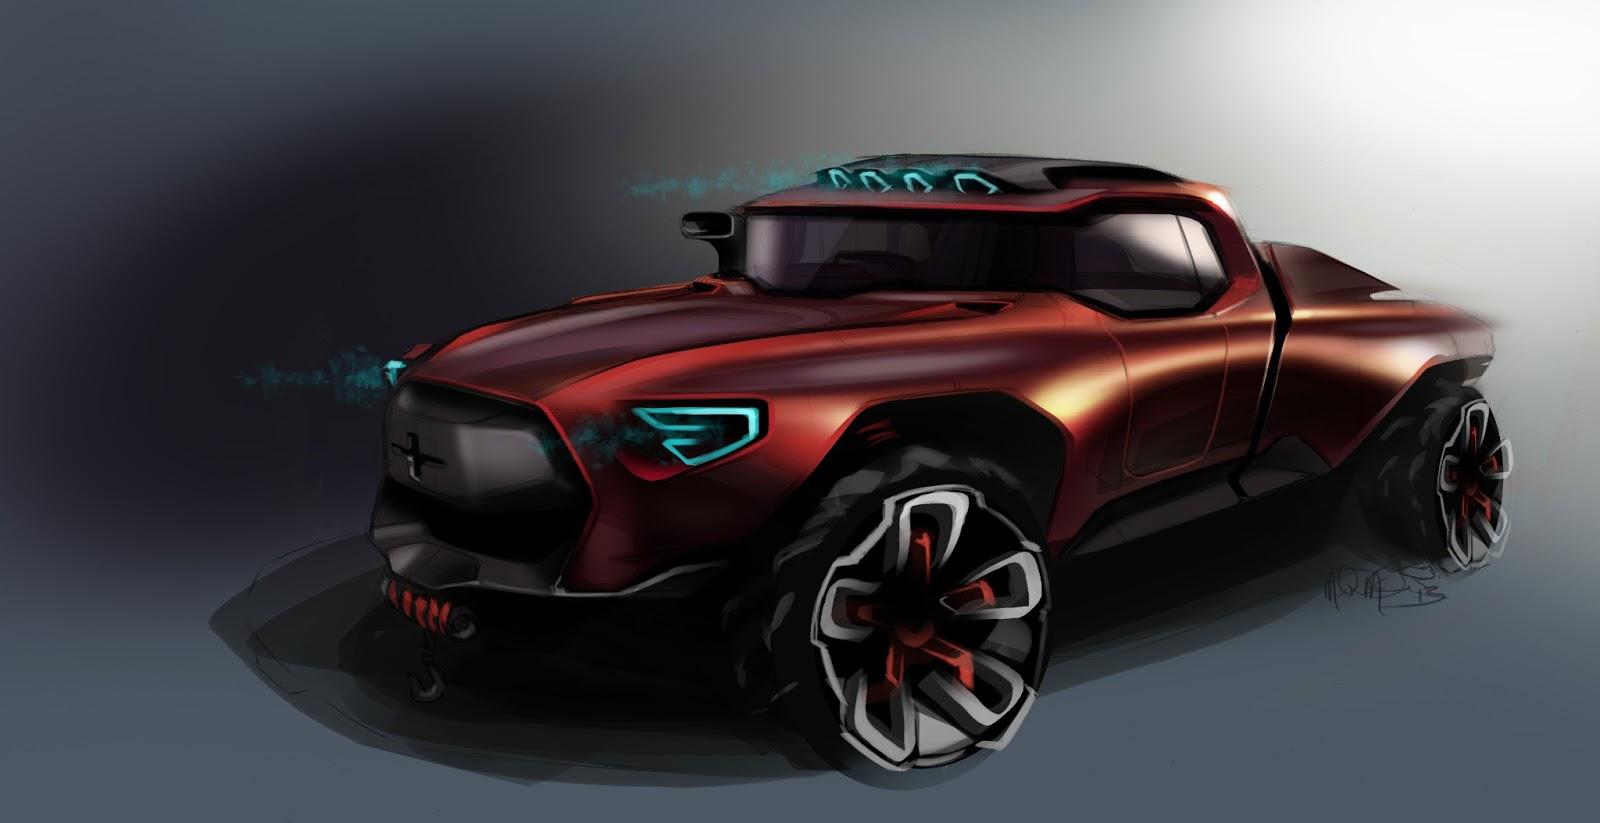 Mcgee Car Design Ram Truck Rendering